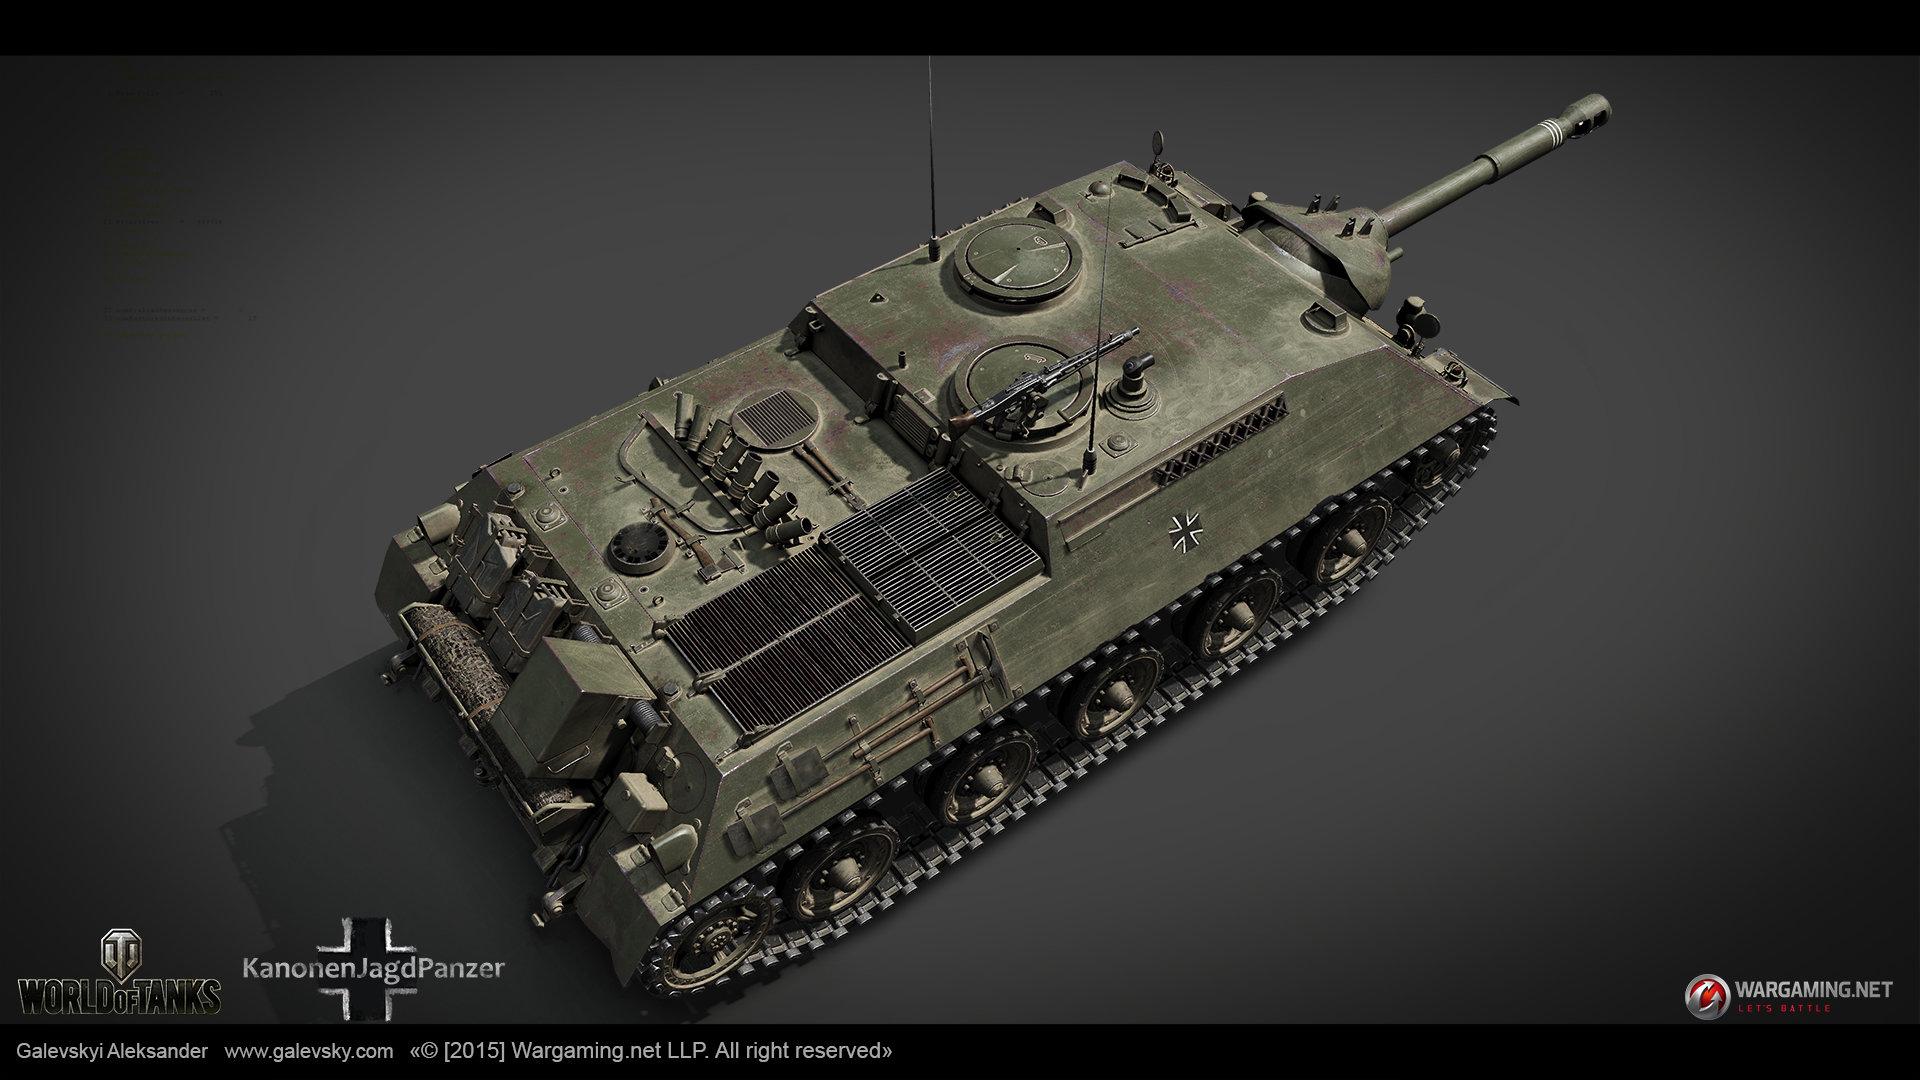 Aleksander galevskyi kanonenjagdpanzer fin small 07